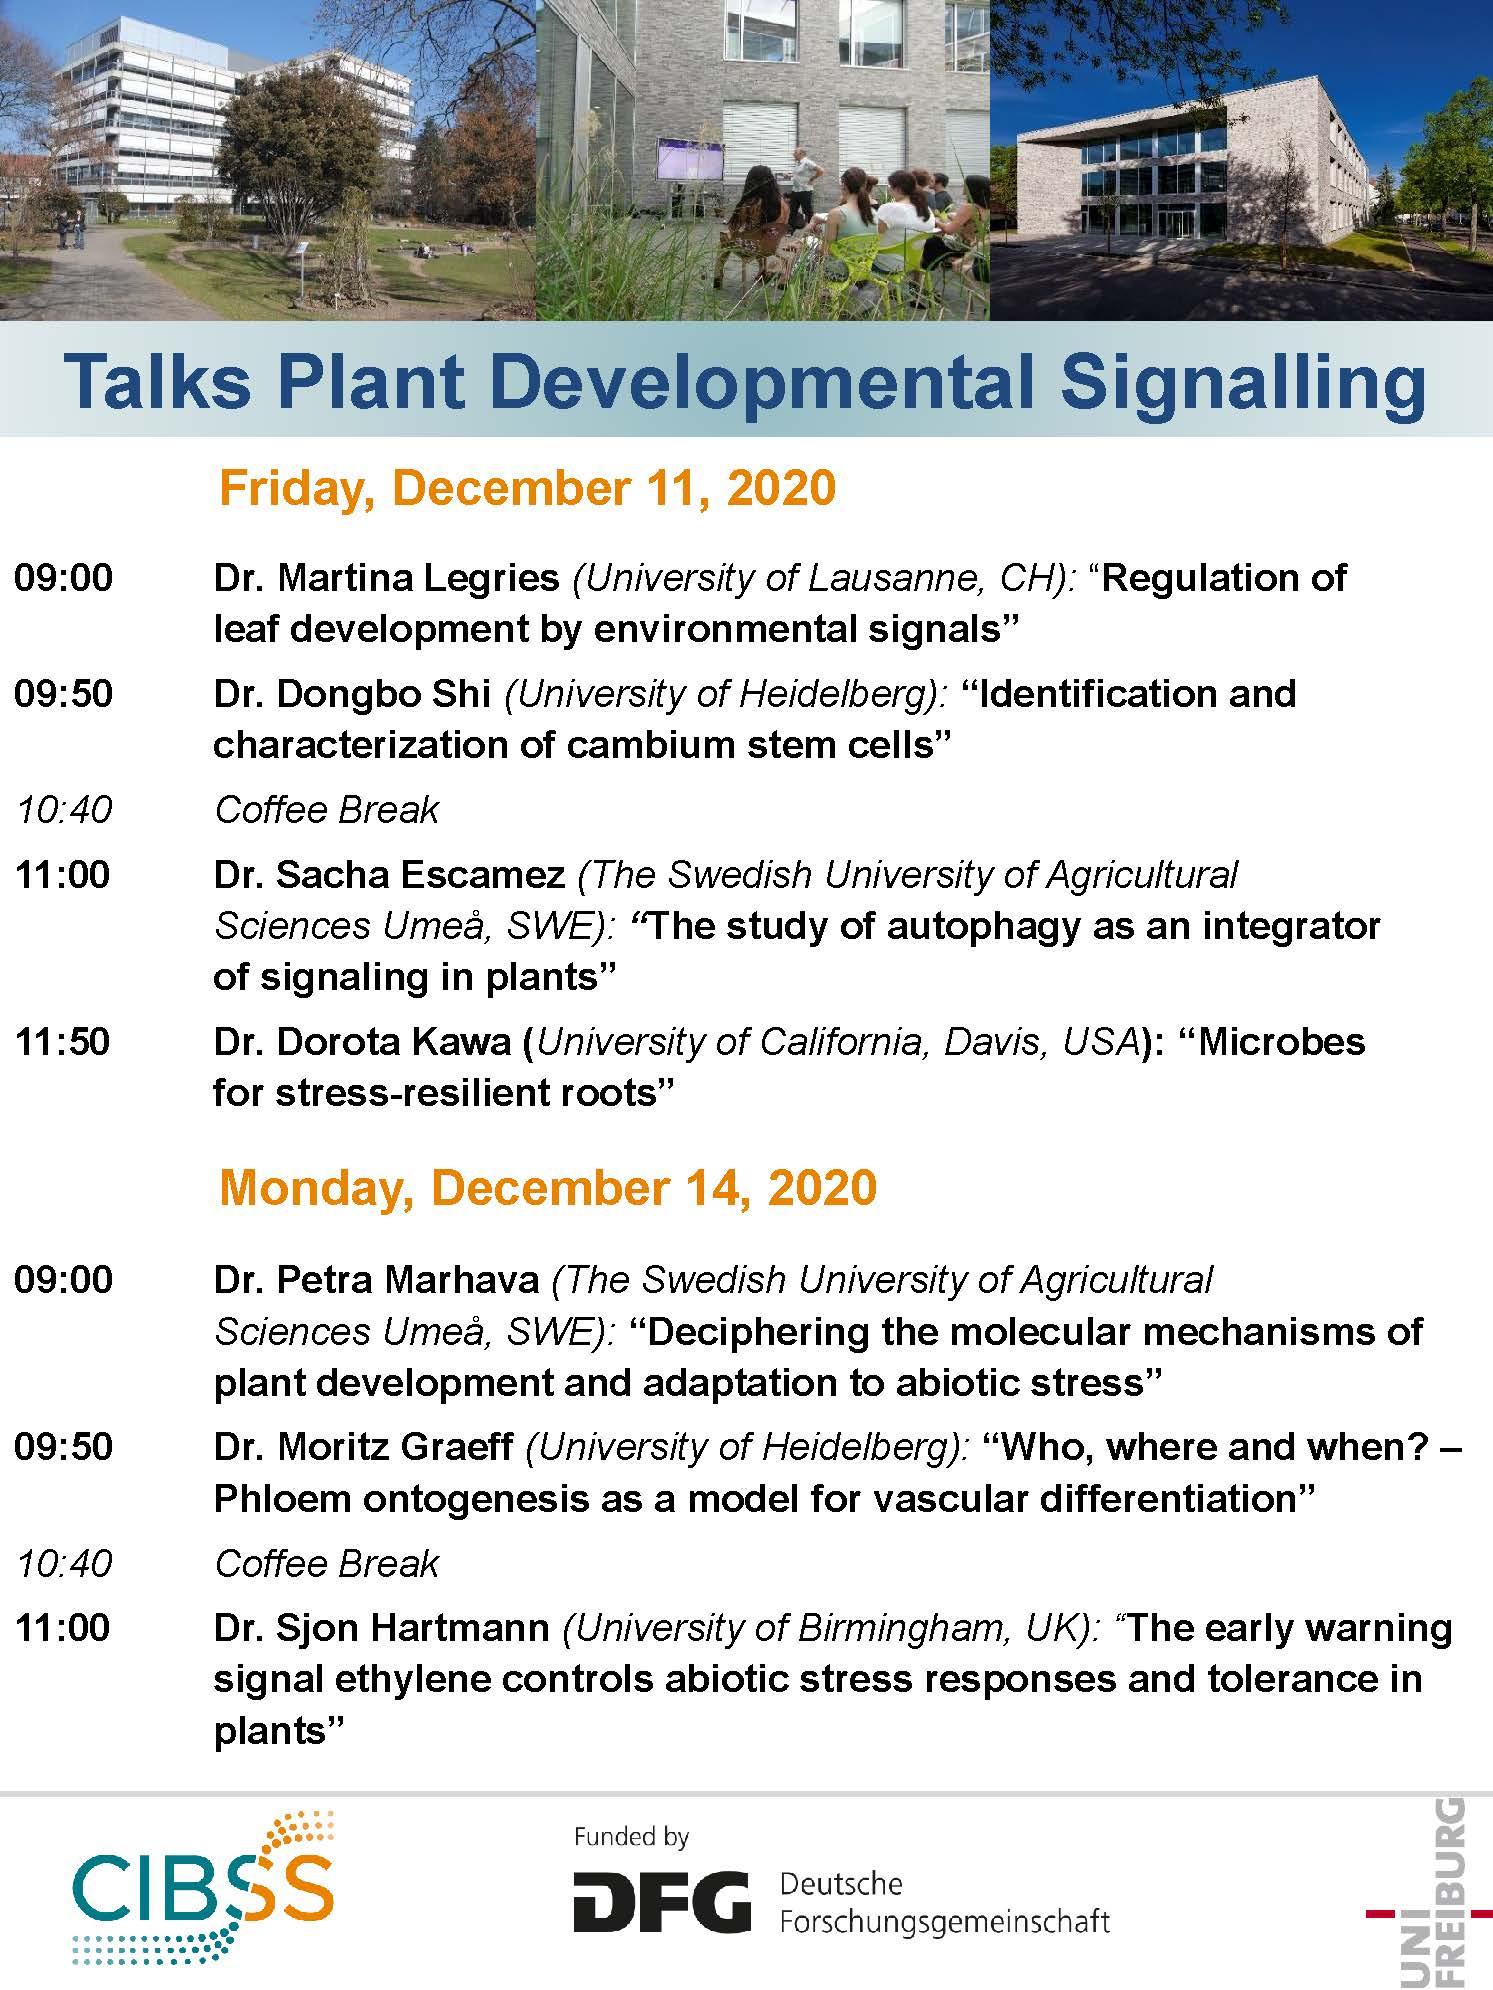 20201211-plantdevelopmentalsignalling.jpg